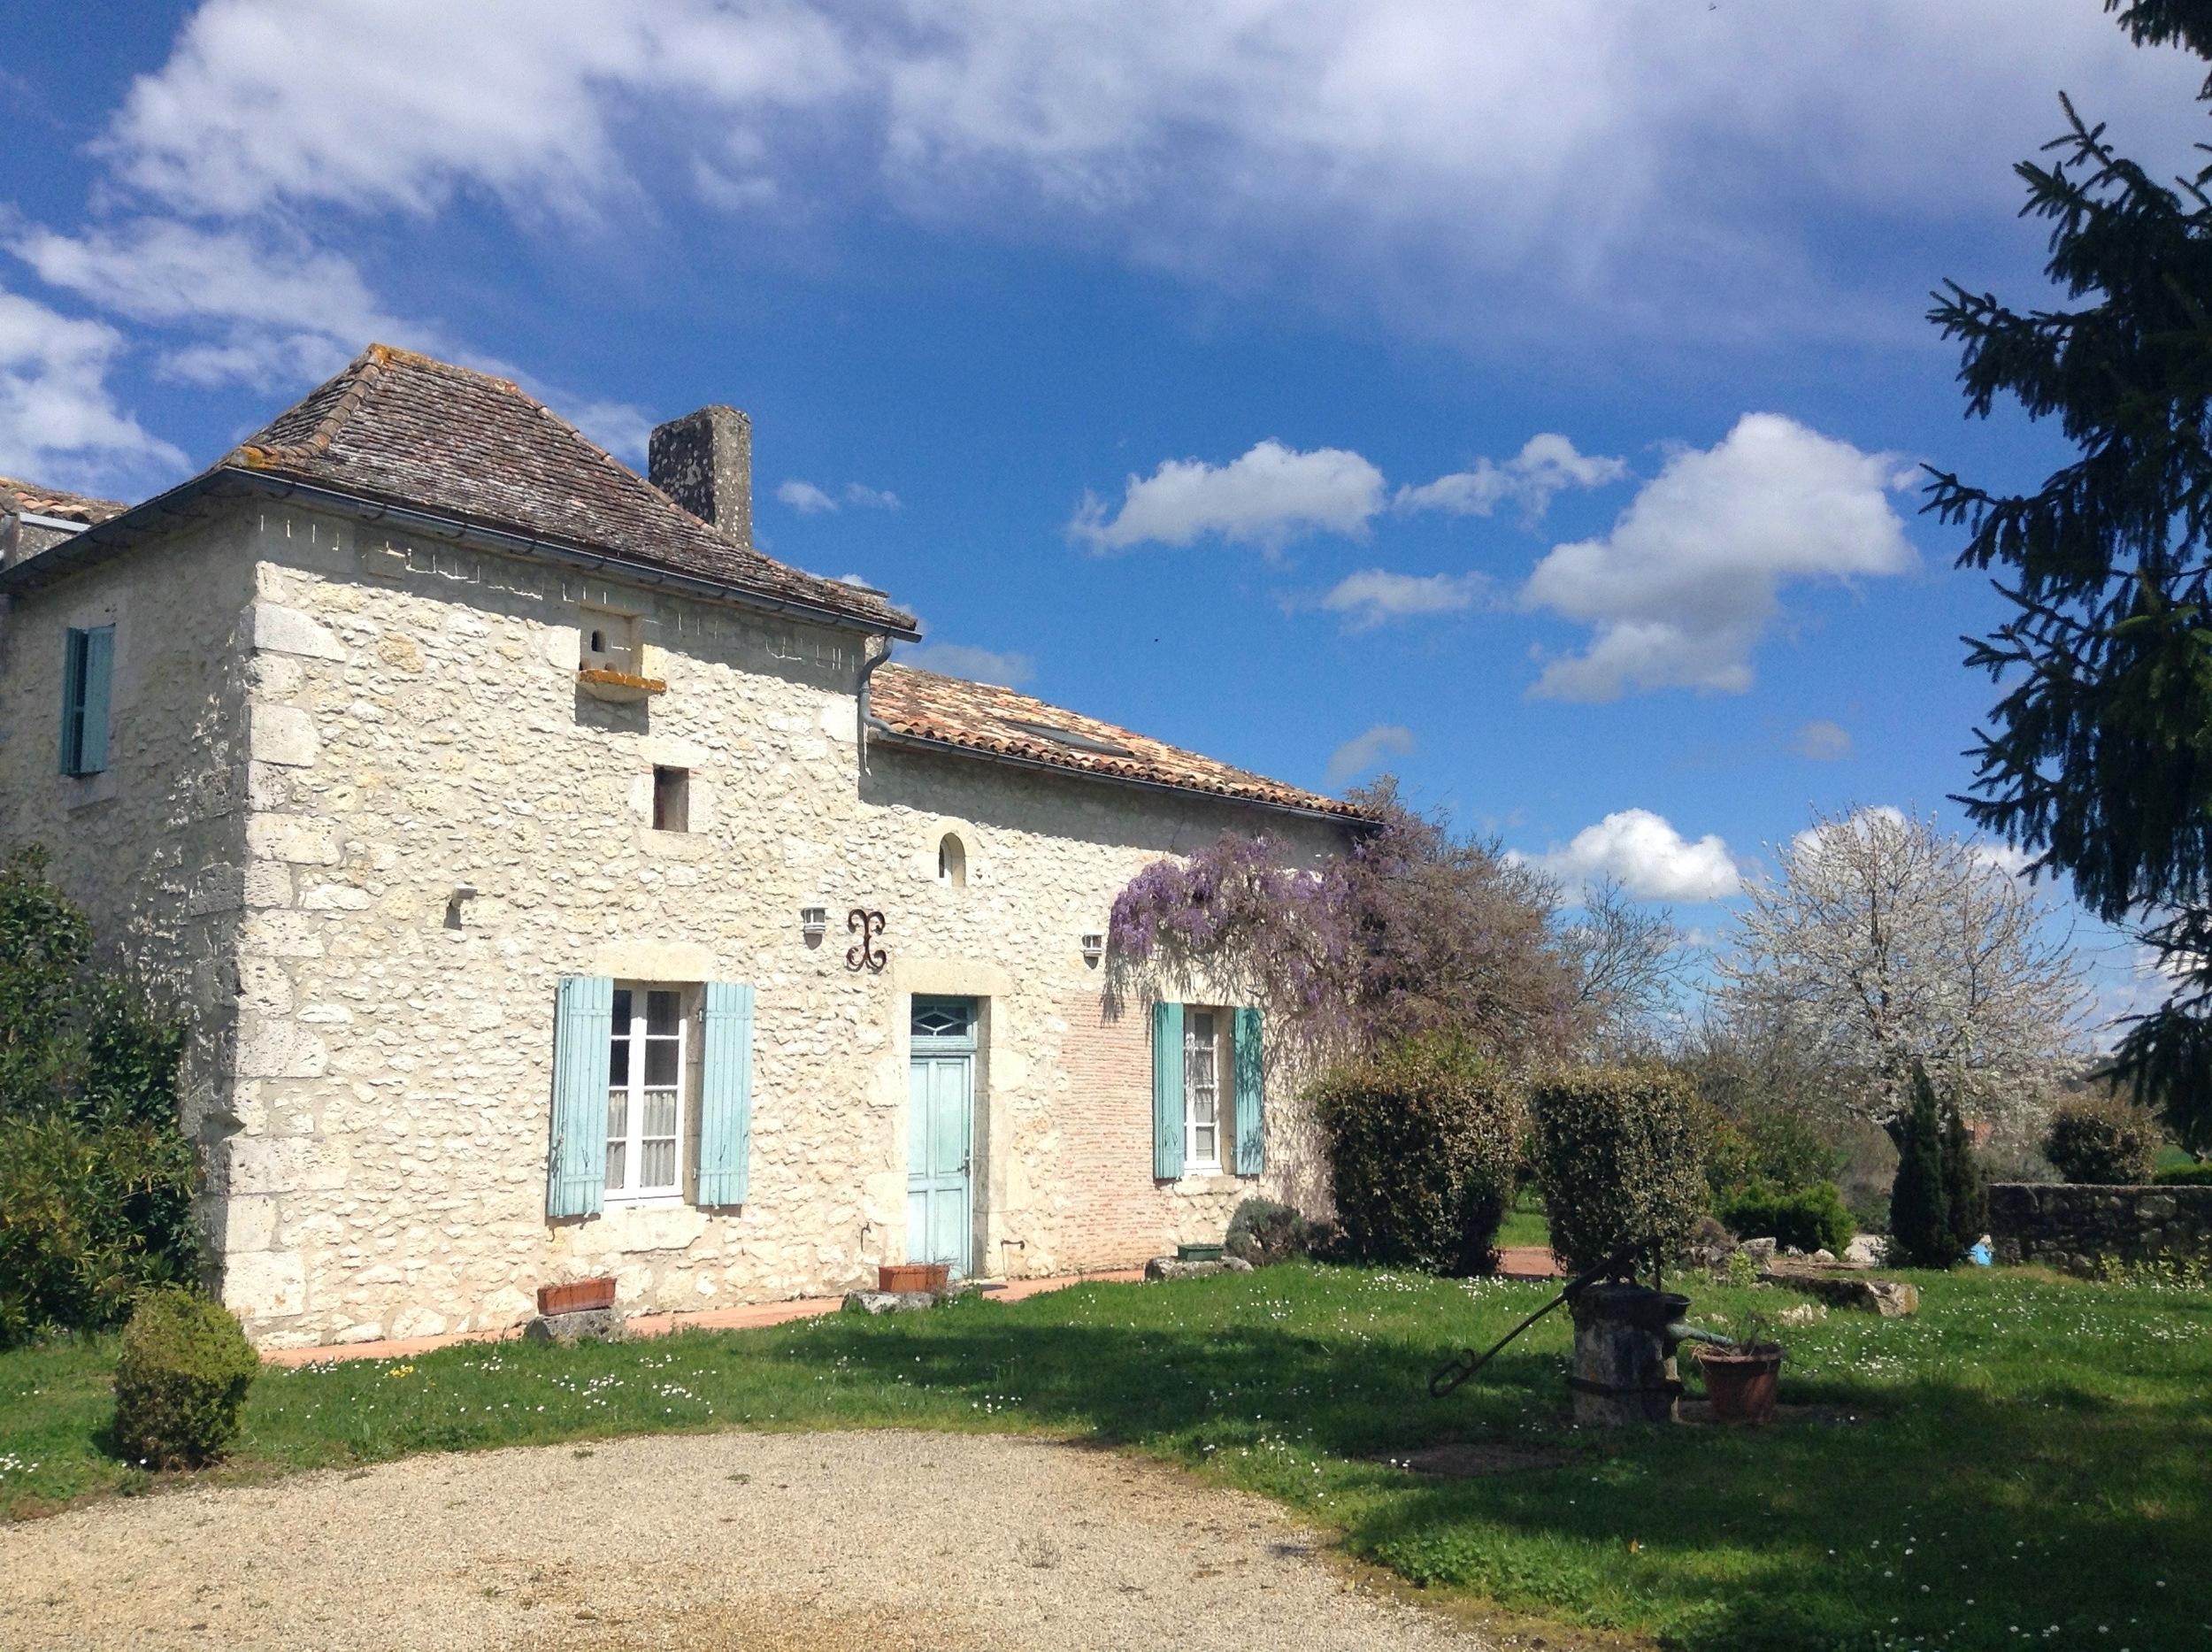 Southern France Farmhouse